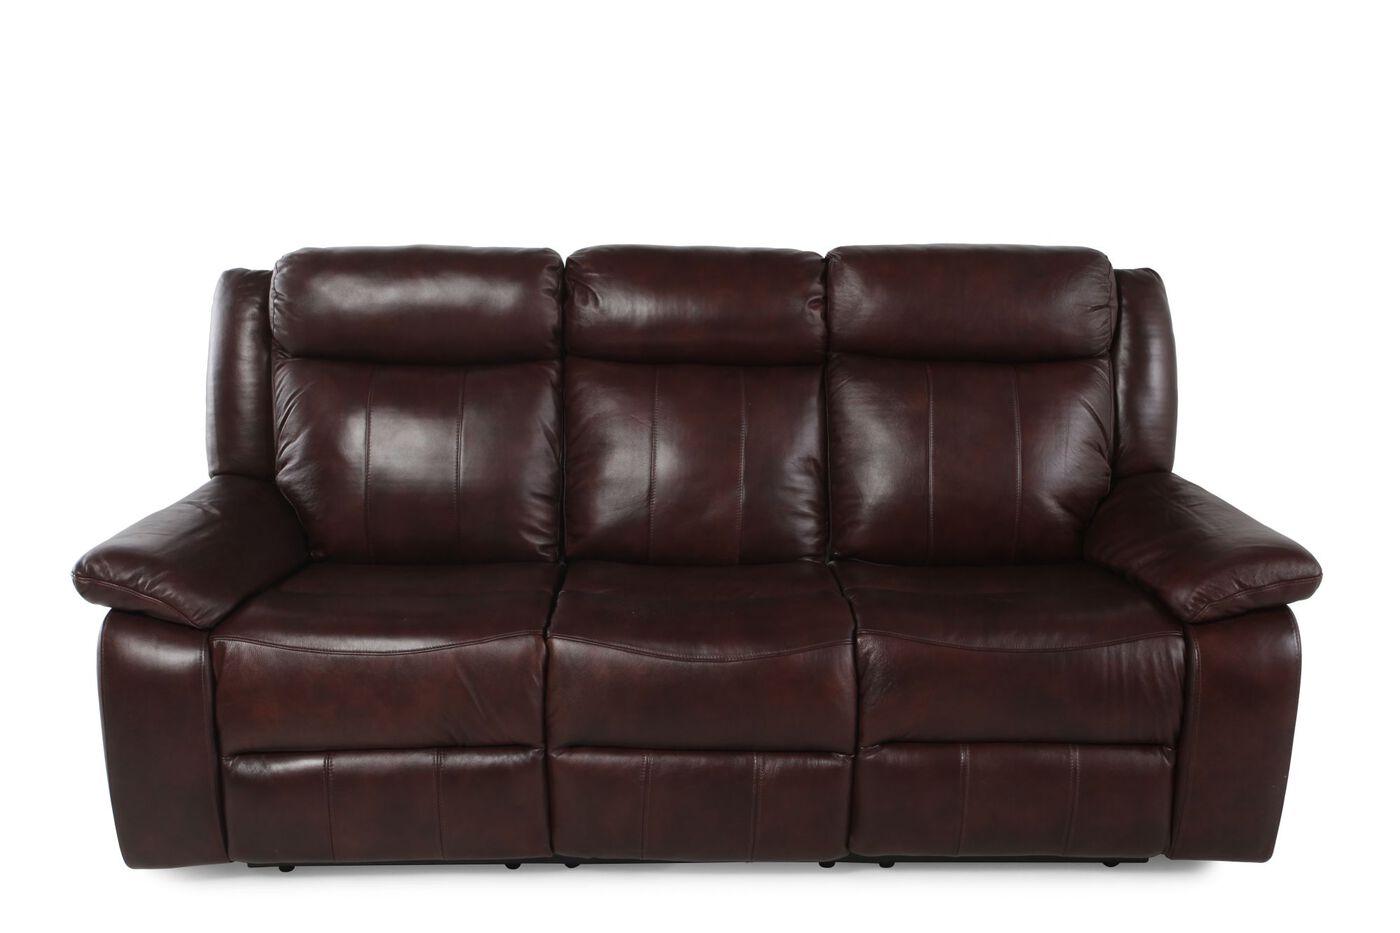 Three Recliner Sofa TheSofa